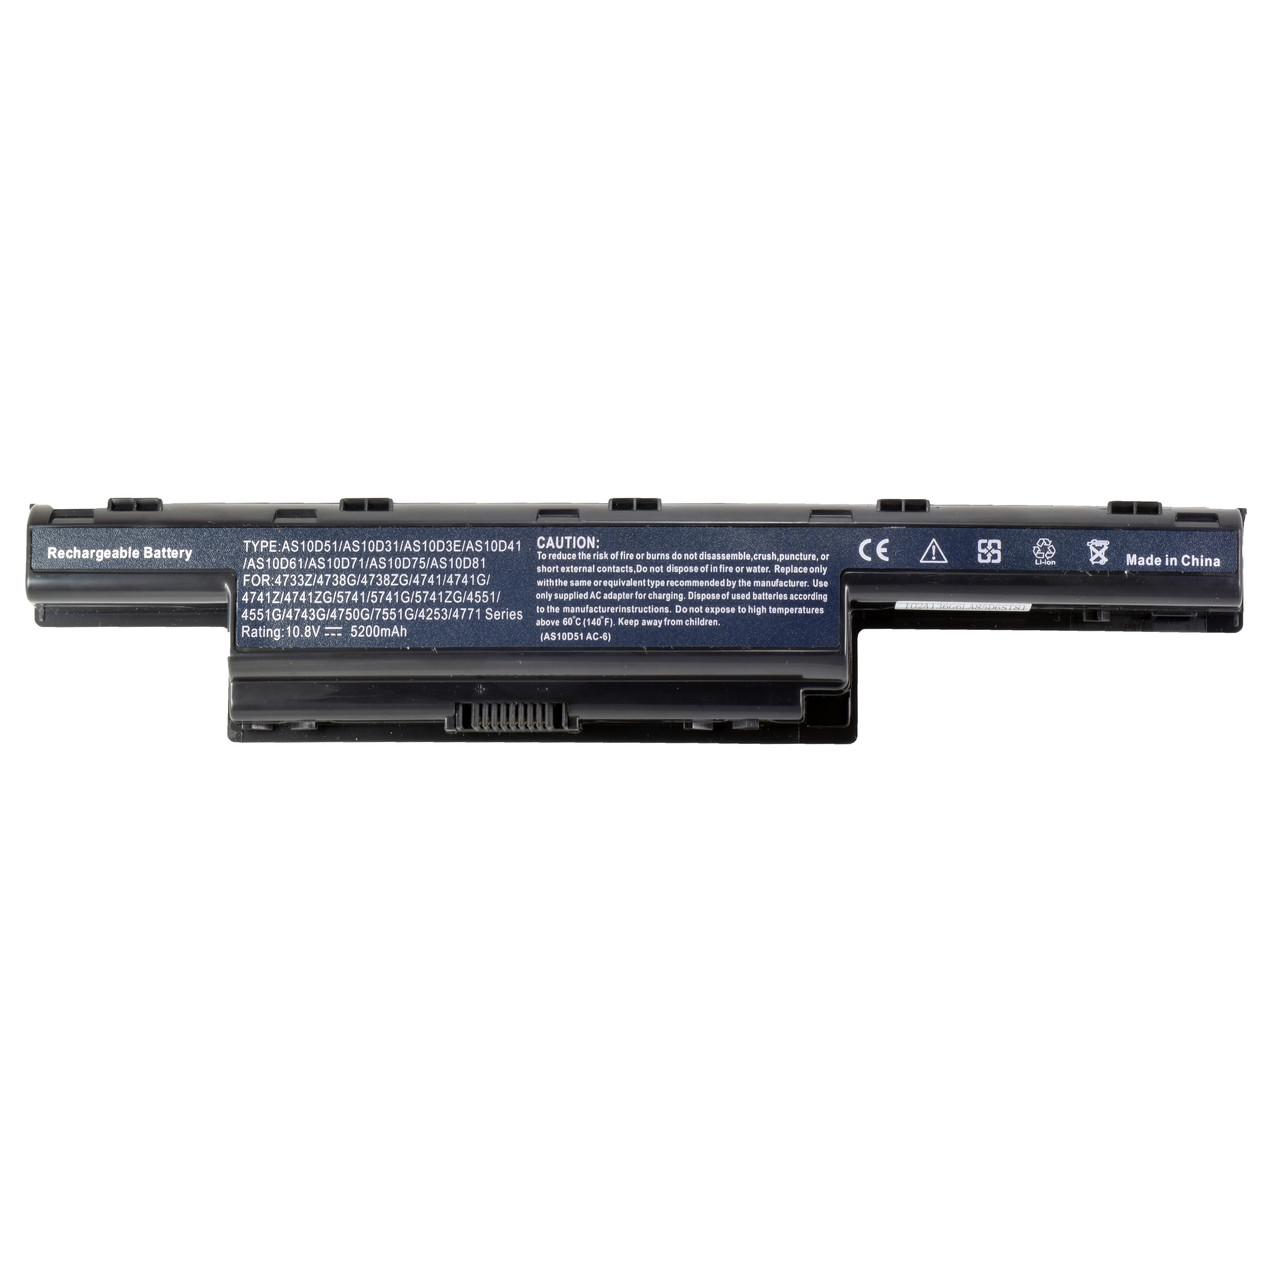 Батарея для ноутбука ACER Aspire 4250-7750 Aspire Aspire E1 Aspire V3 TravelMate 4740 - 7750 GATEWAY